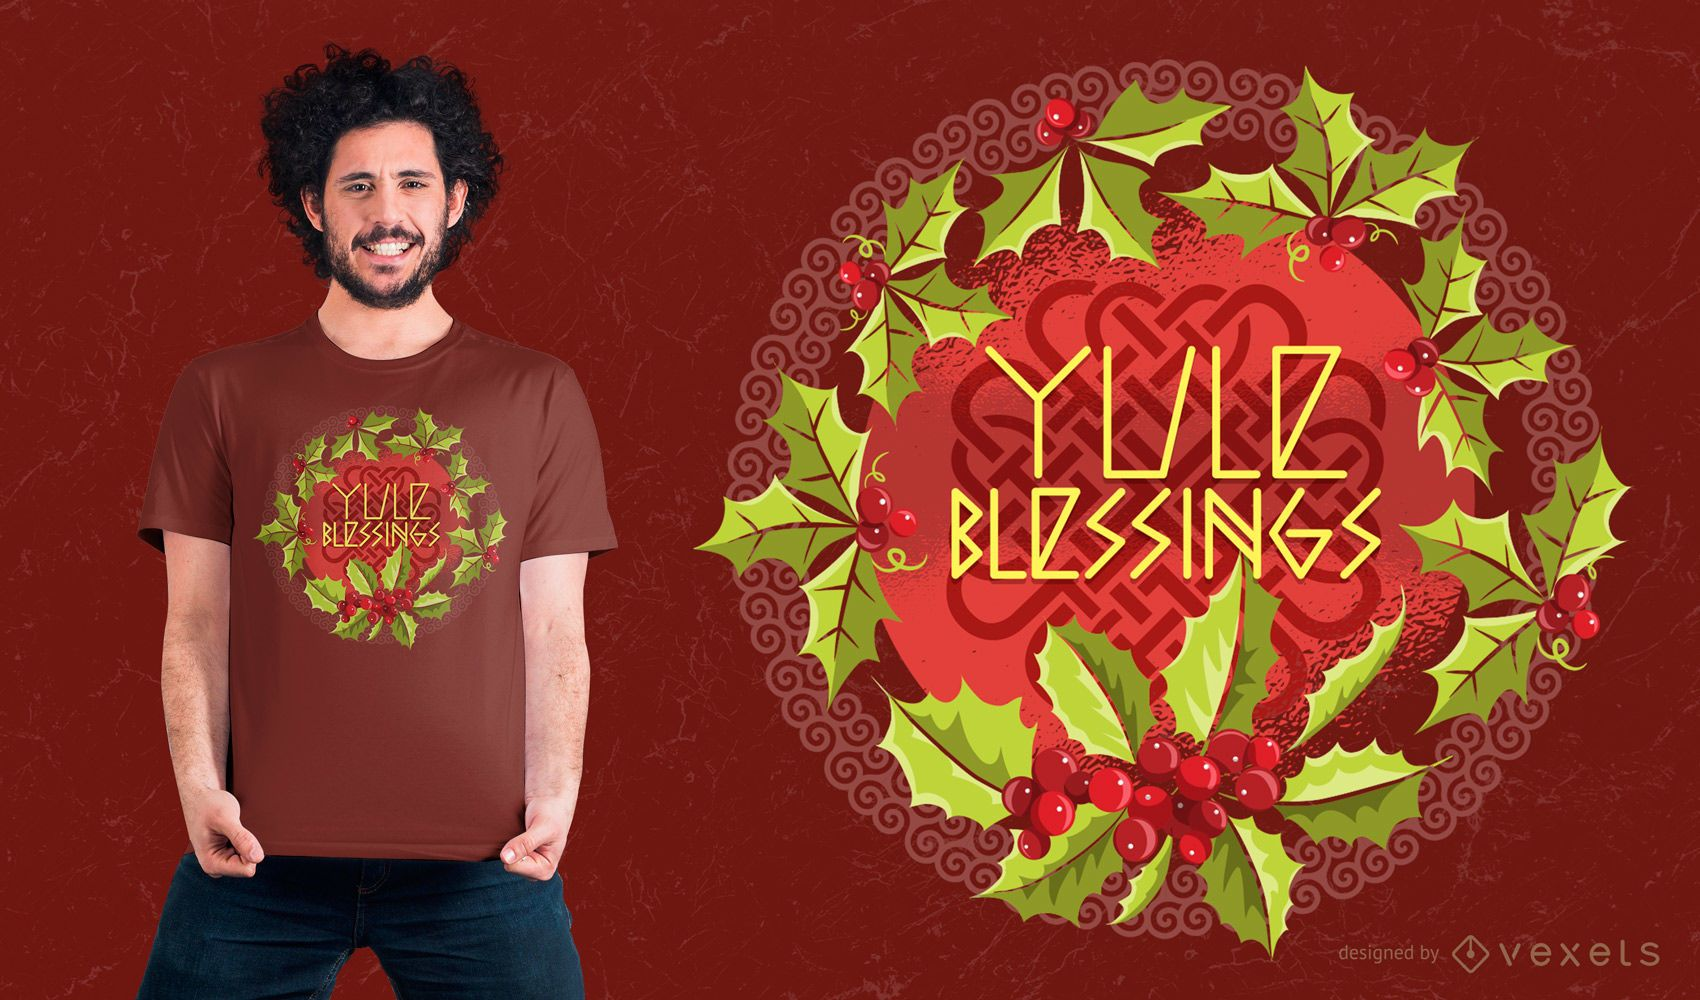 Yule Blessings T-shirt Design